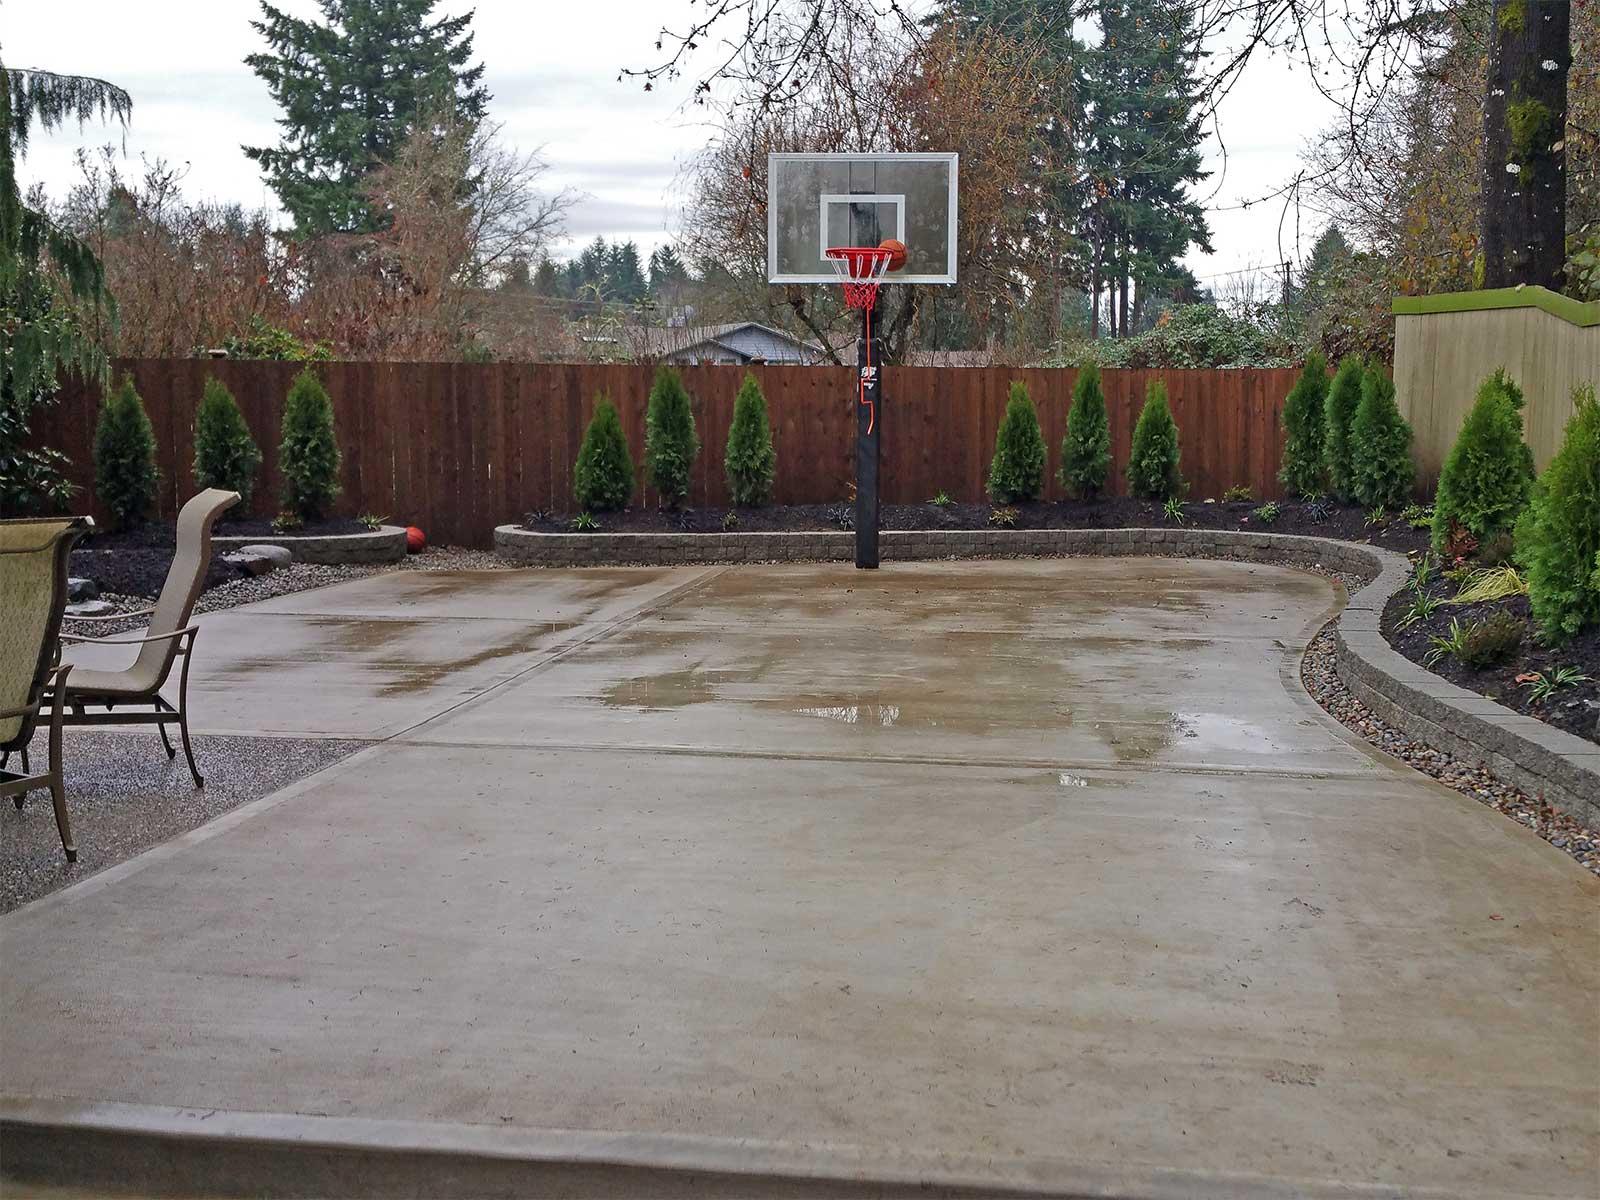 Southeast Olympia Backyard Entertainment Area & Kennel ... on Concrete Slab Backyard Ideas id=13977